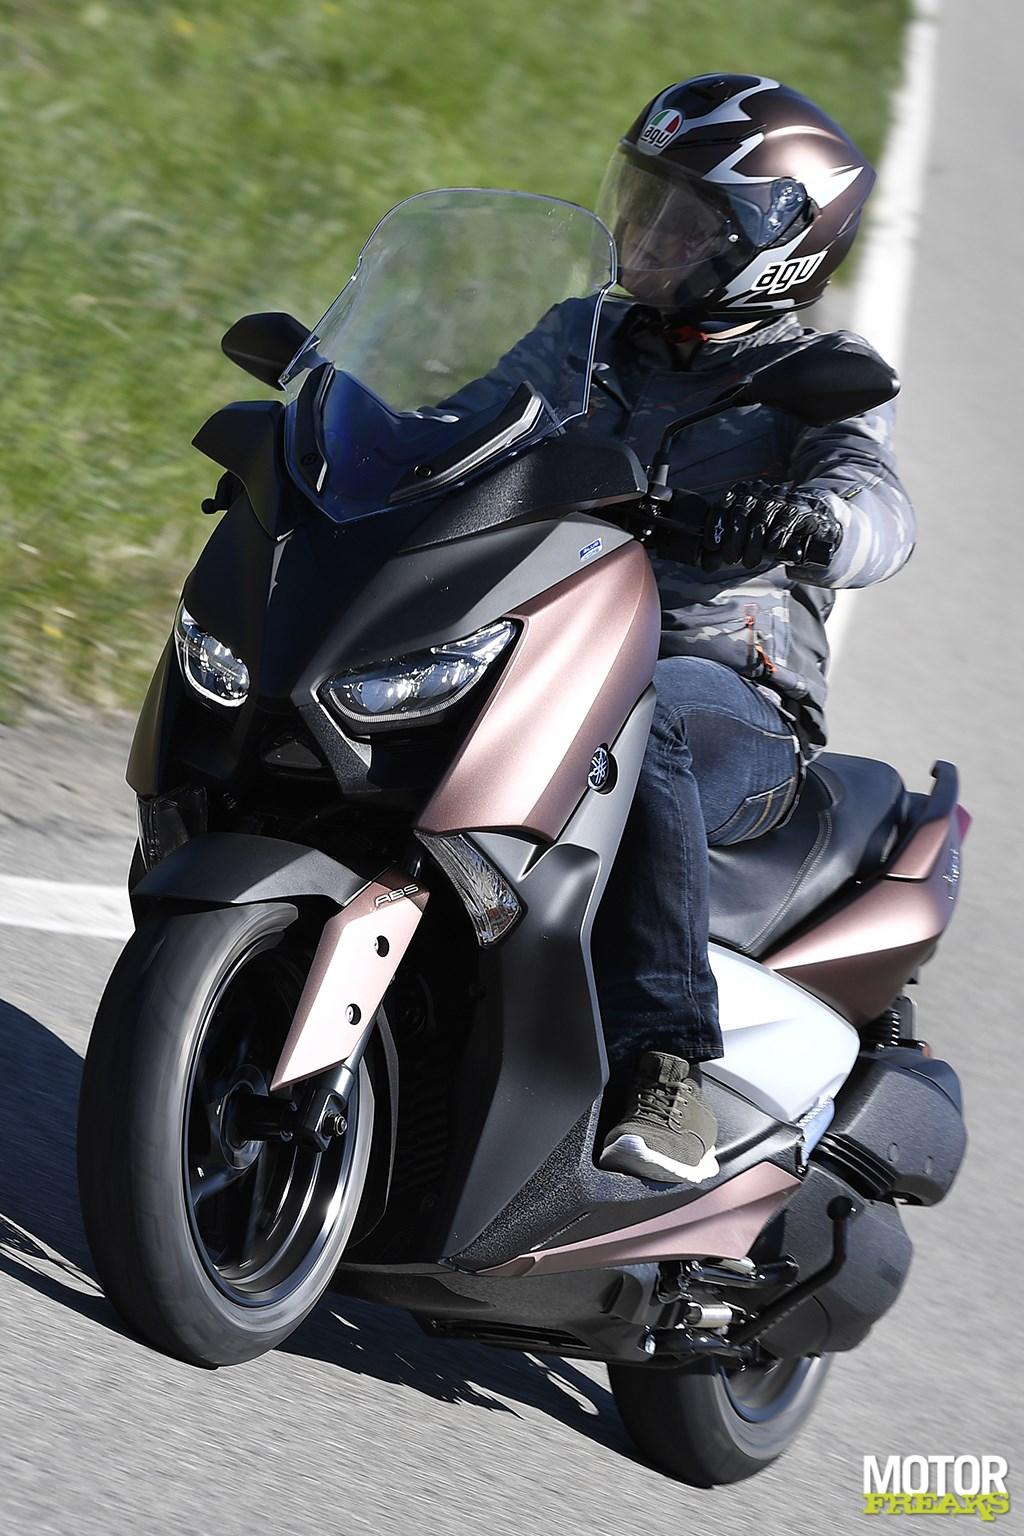 Motorfreaks - Test: Yamaha X-MAX 300 - Conclusie